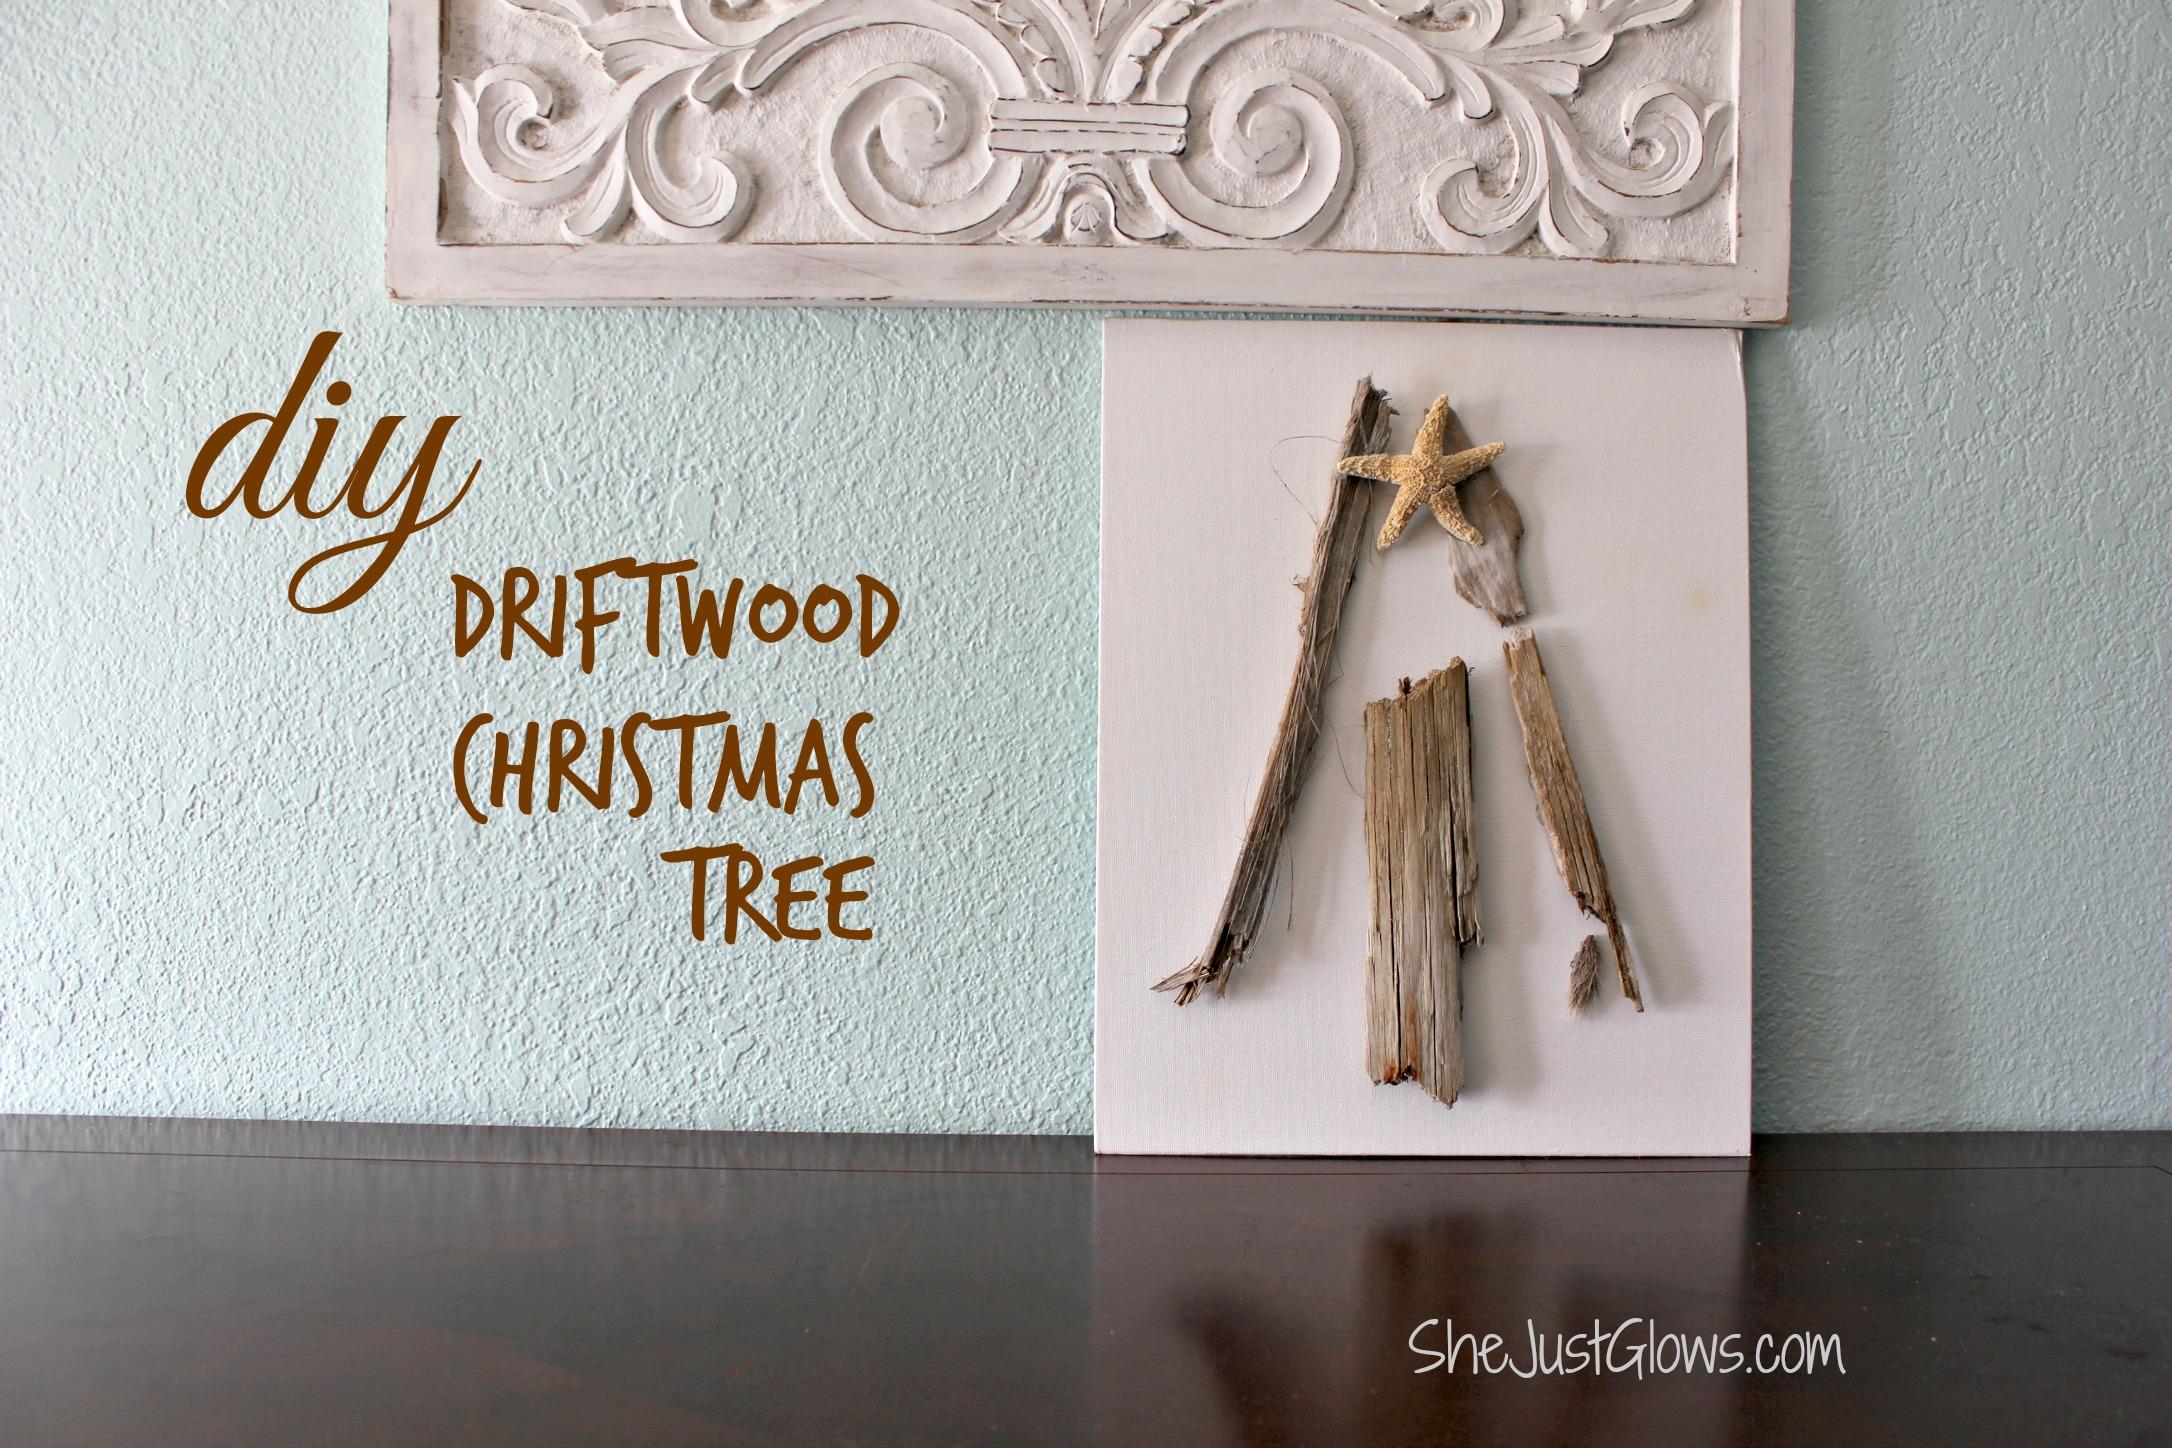 DIY Canvas Art: Driftwood Christmas Tree Canvas SheJustGlows.com